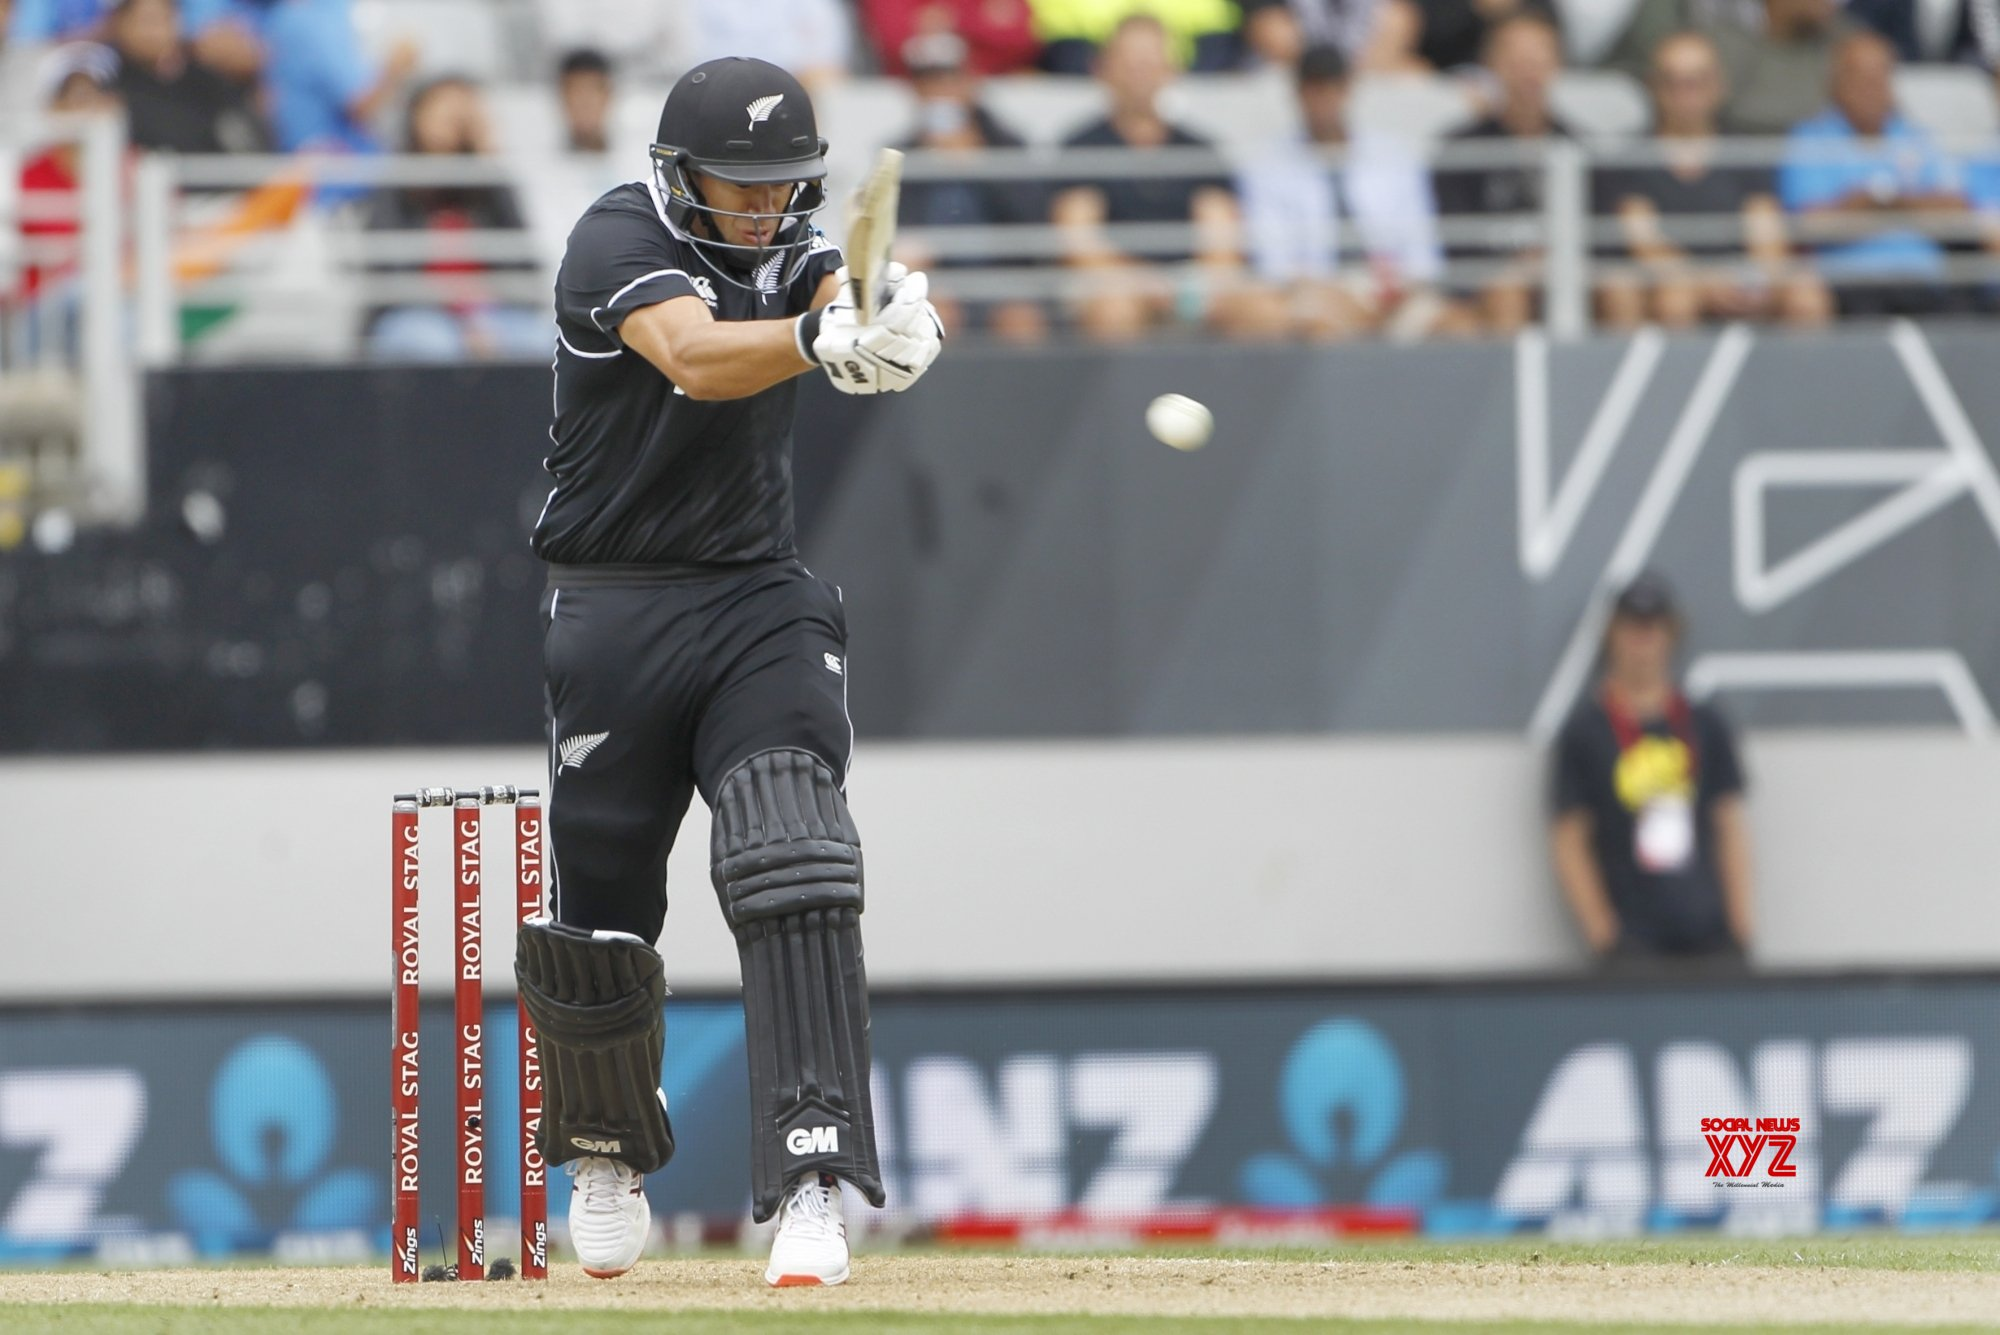 Auckland: 2nd ODI - India Vs New Zealand (Batch - 11) #Gallery